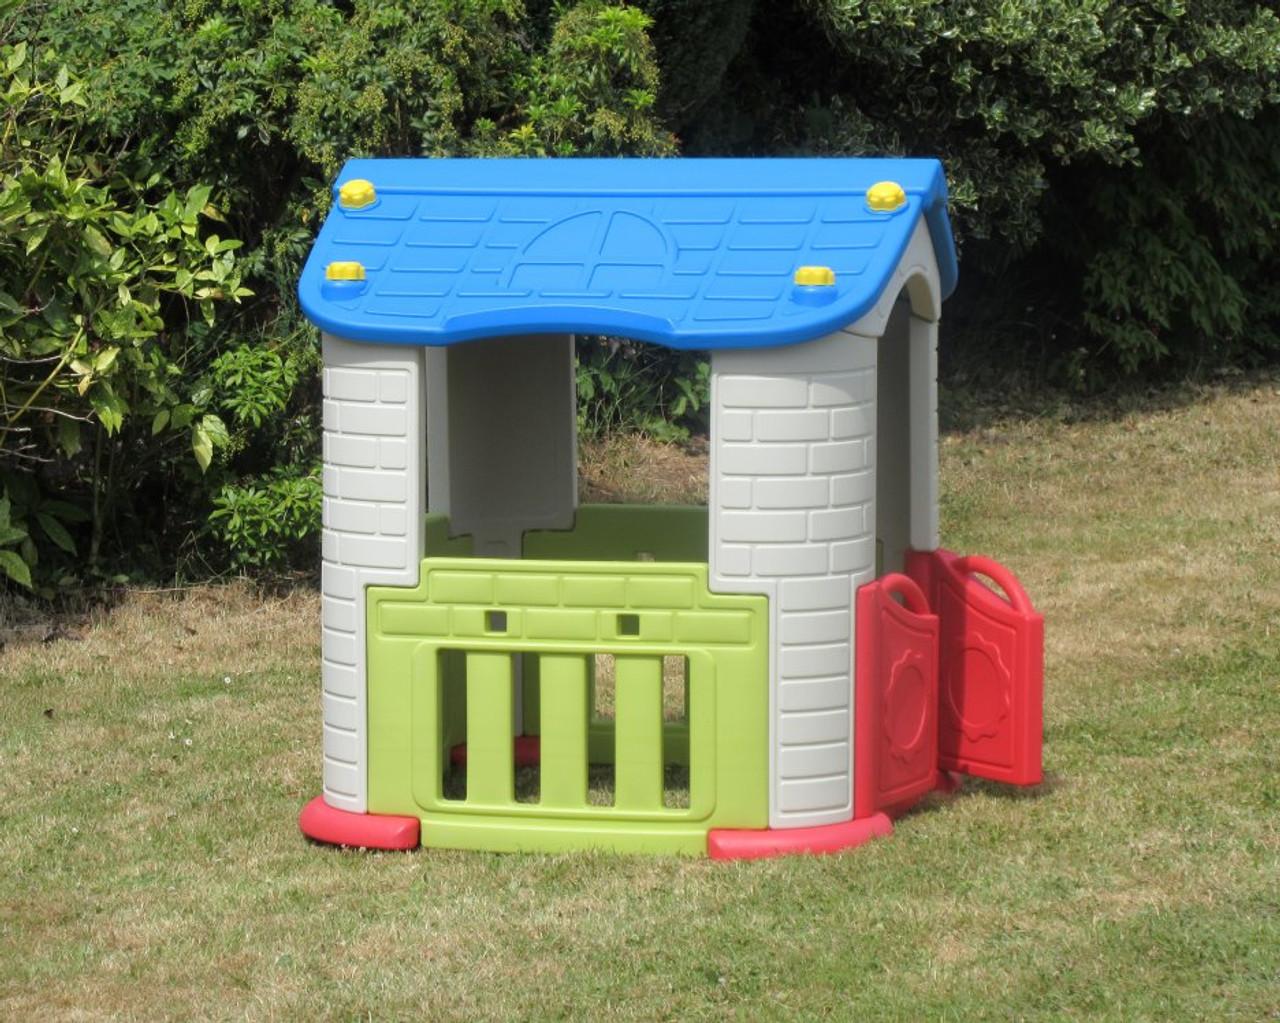 Sunshine Childrens Playhouse Purple Roof Pink Door